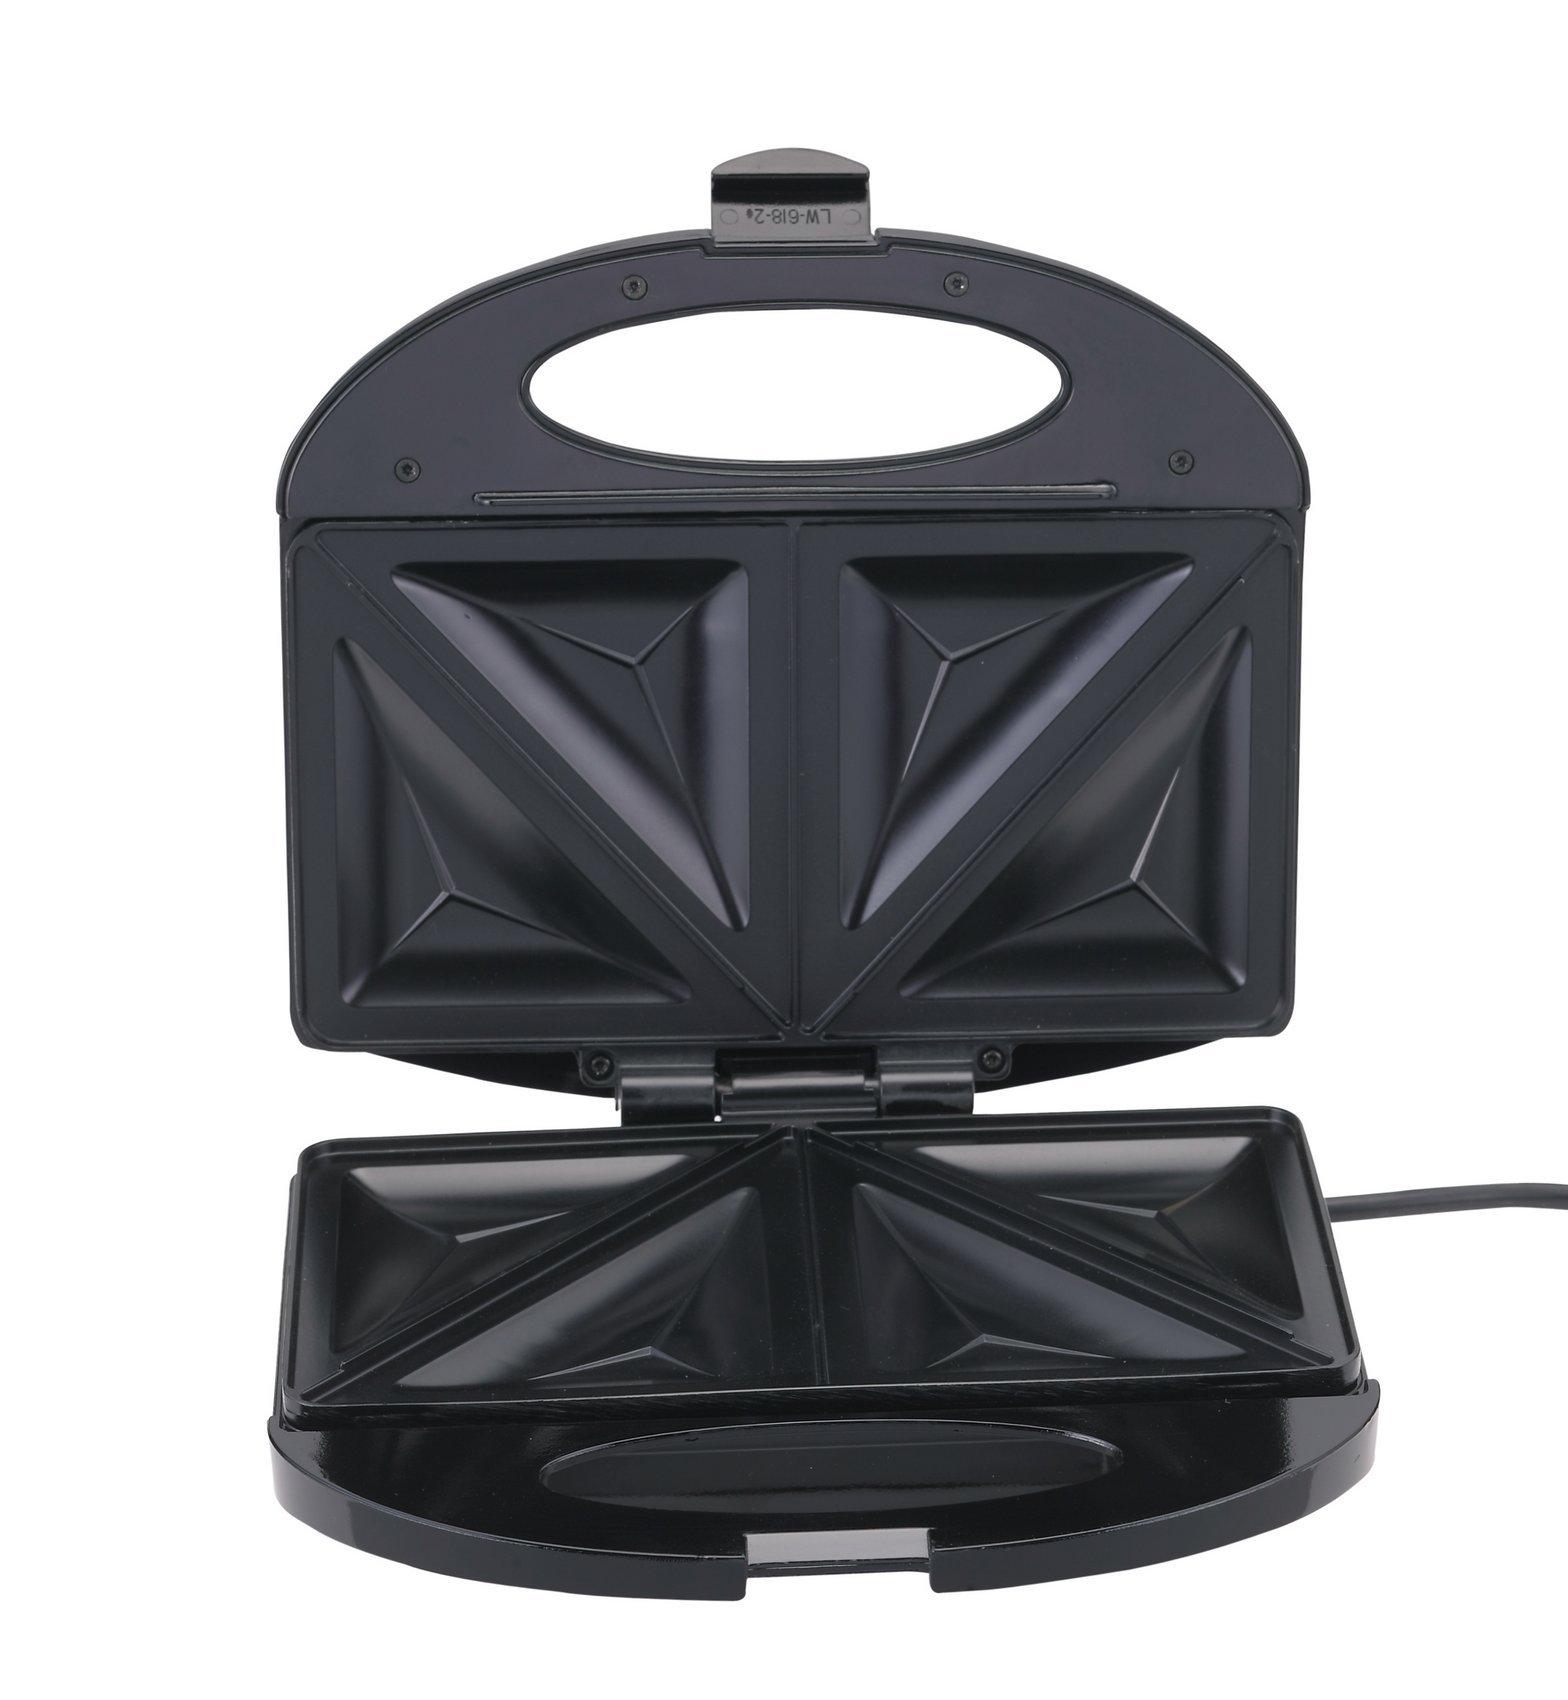 BLACK & DECKER TS 1000 220V Sandwich Maker 600W 220-240V (Not for USA), Black by BLACK+DECKER (Image #4)